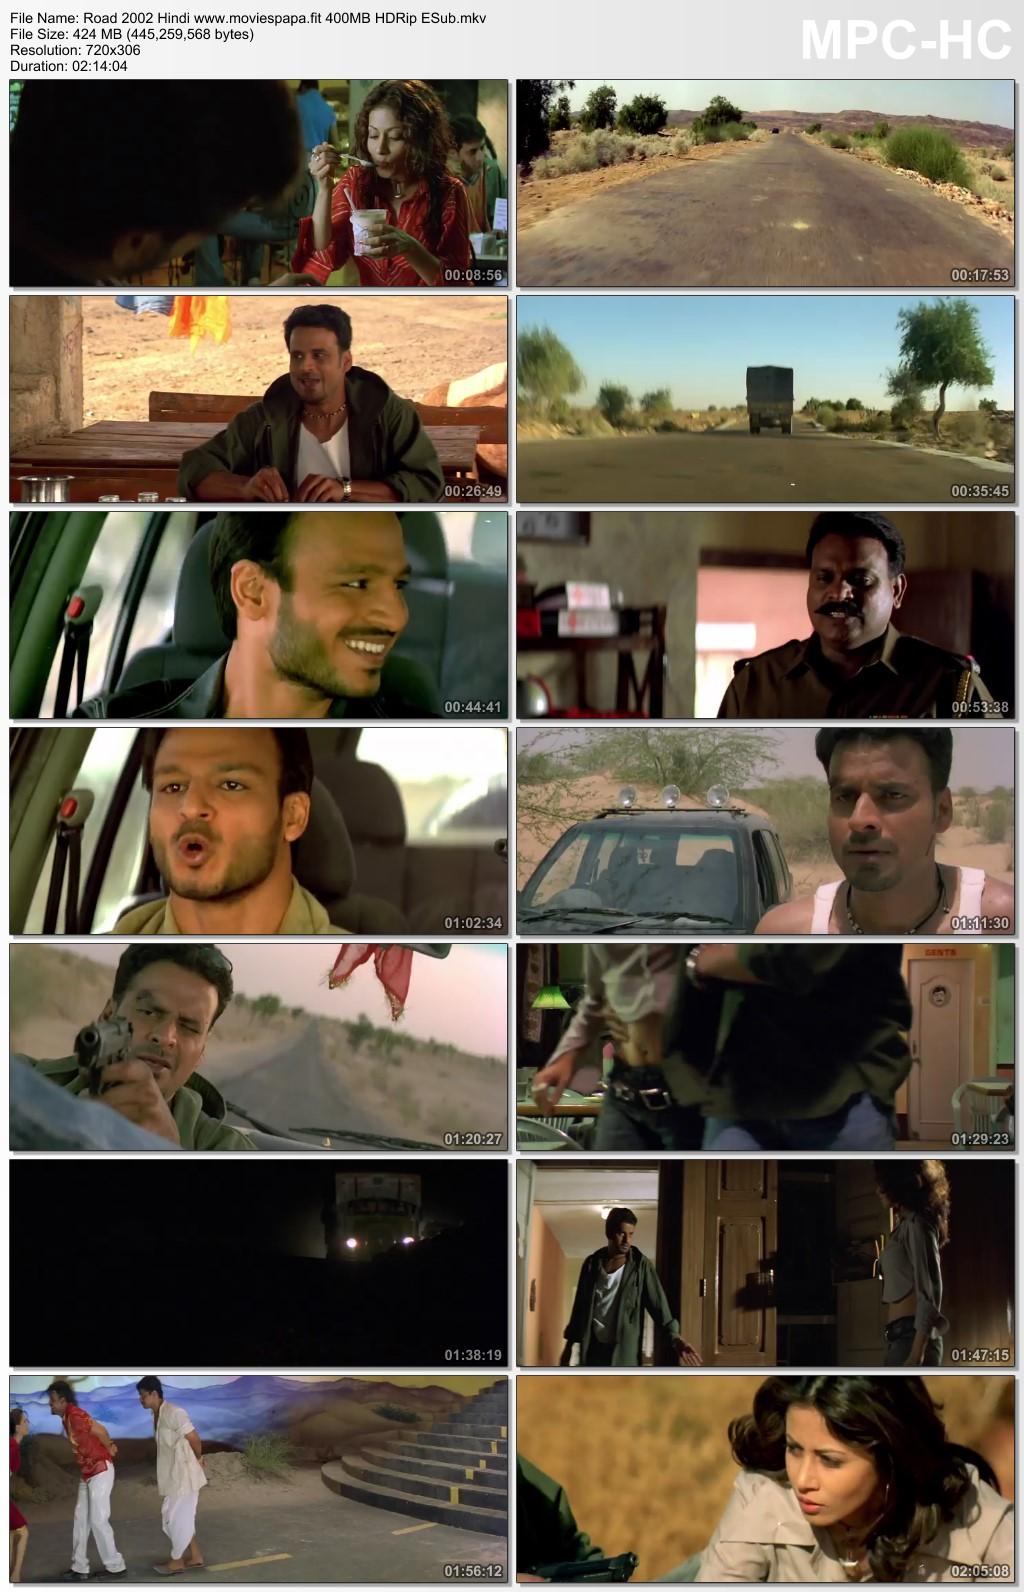 Road 2002 Hindi Movie 450MB HDRip ESub Download